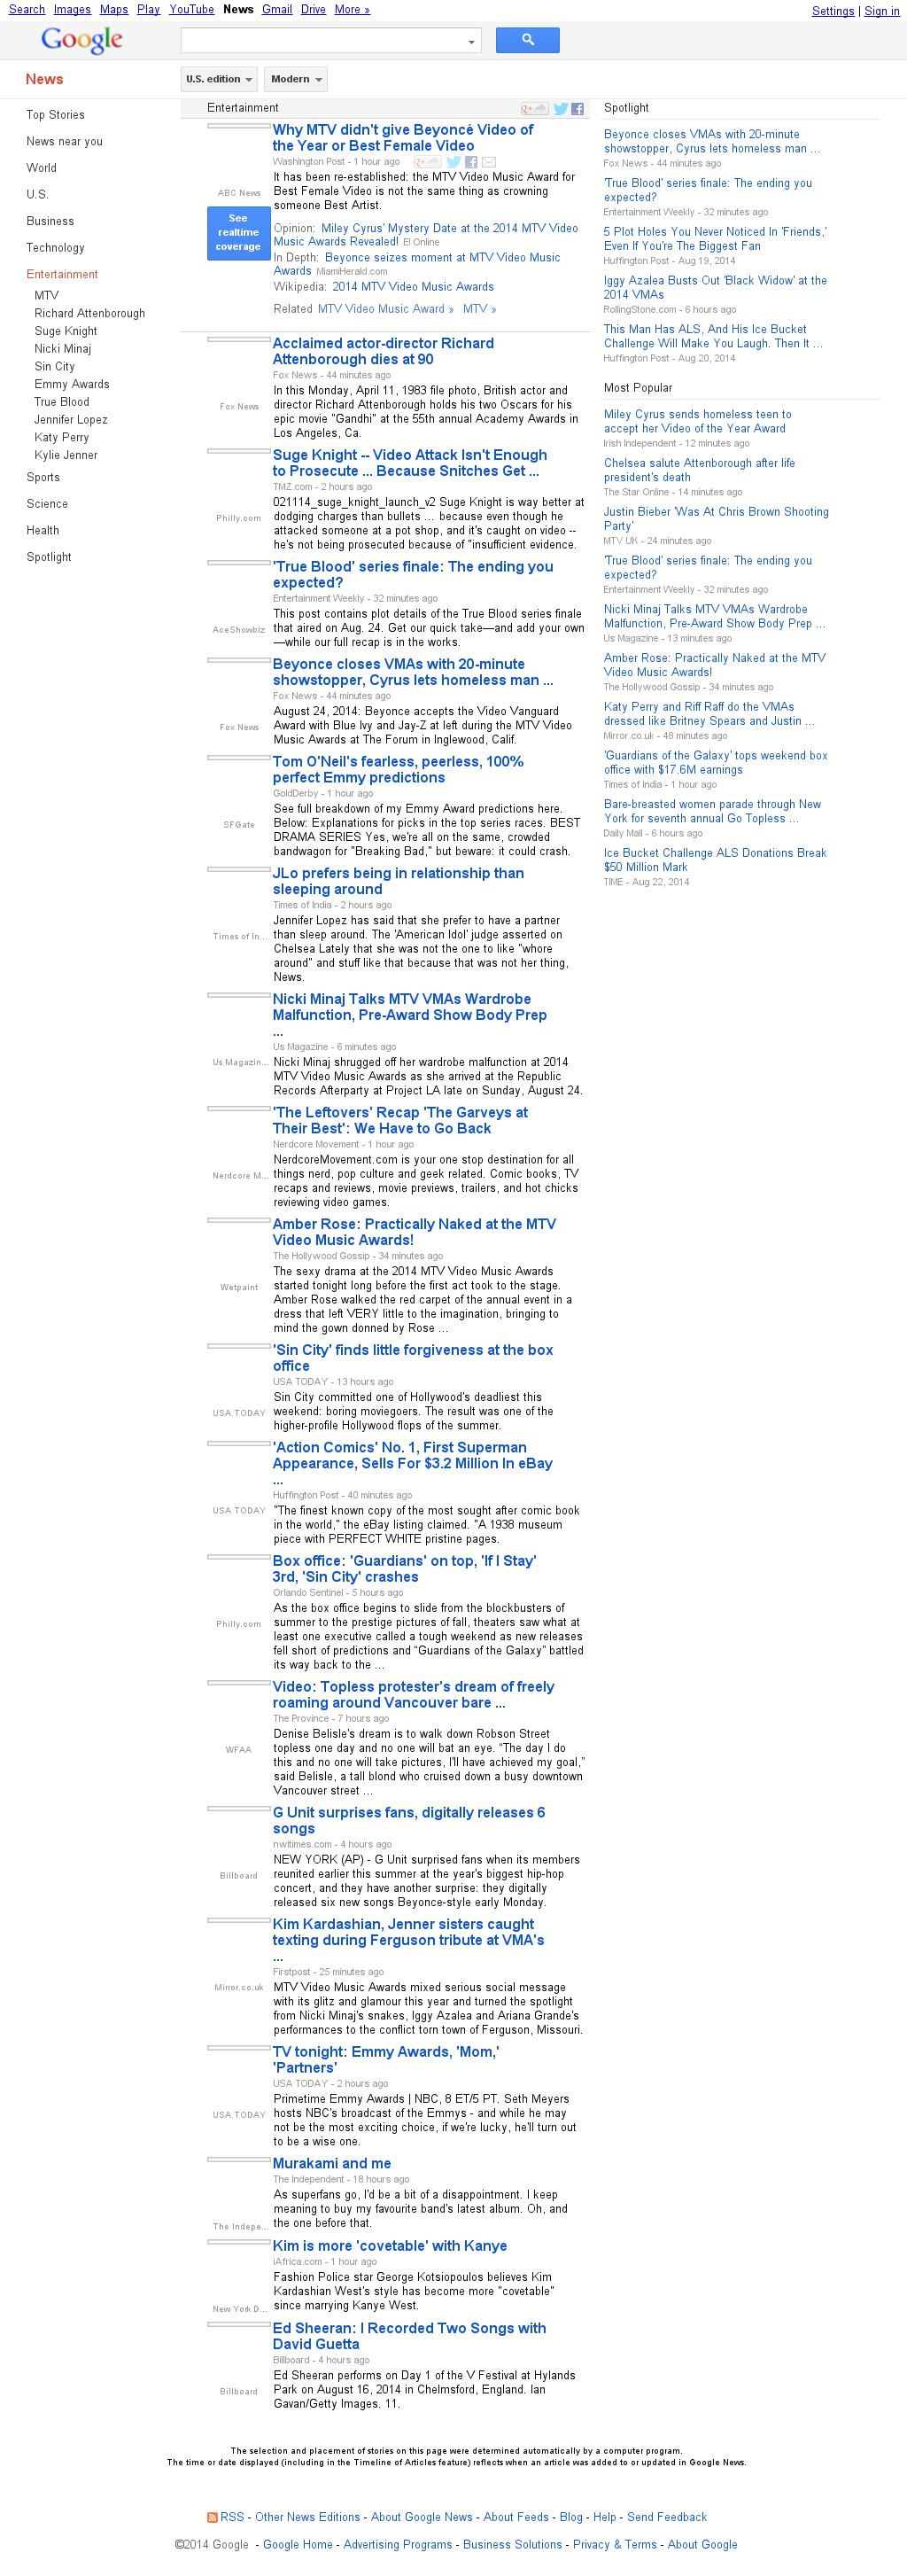 Google News: Entertainment at Monday Aug. 25, 2014, 10:08 a.m. UTC